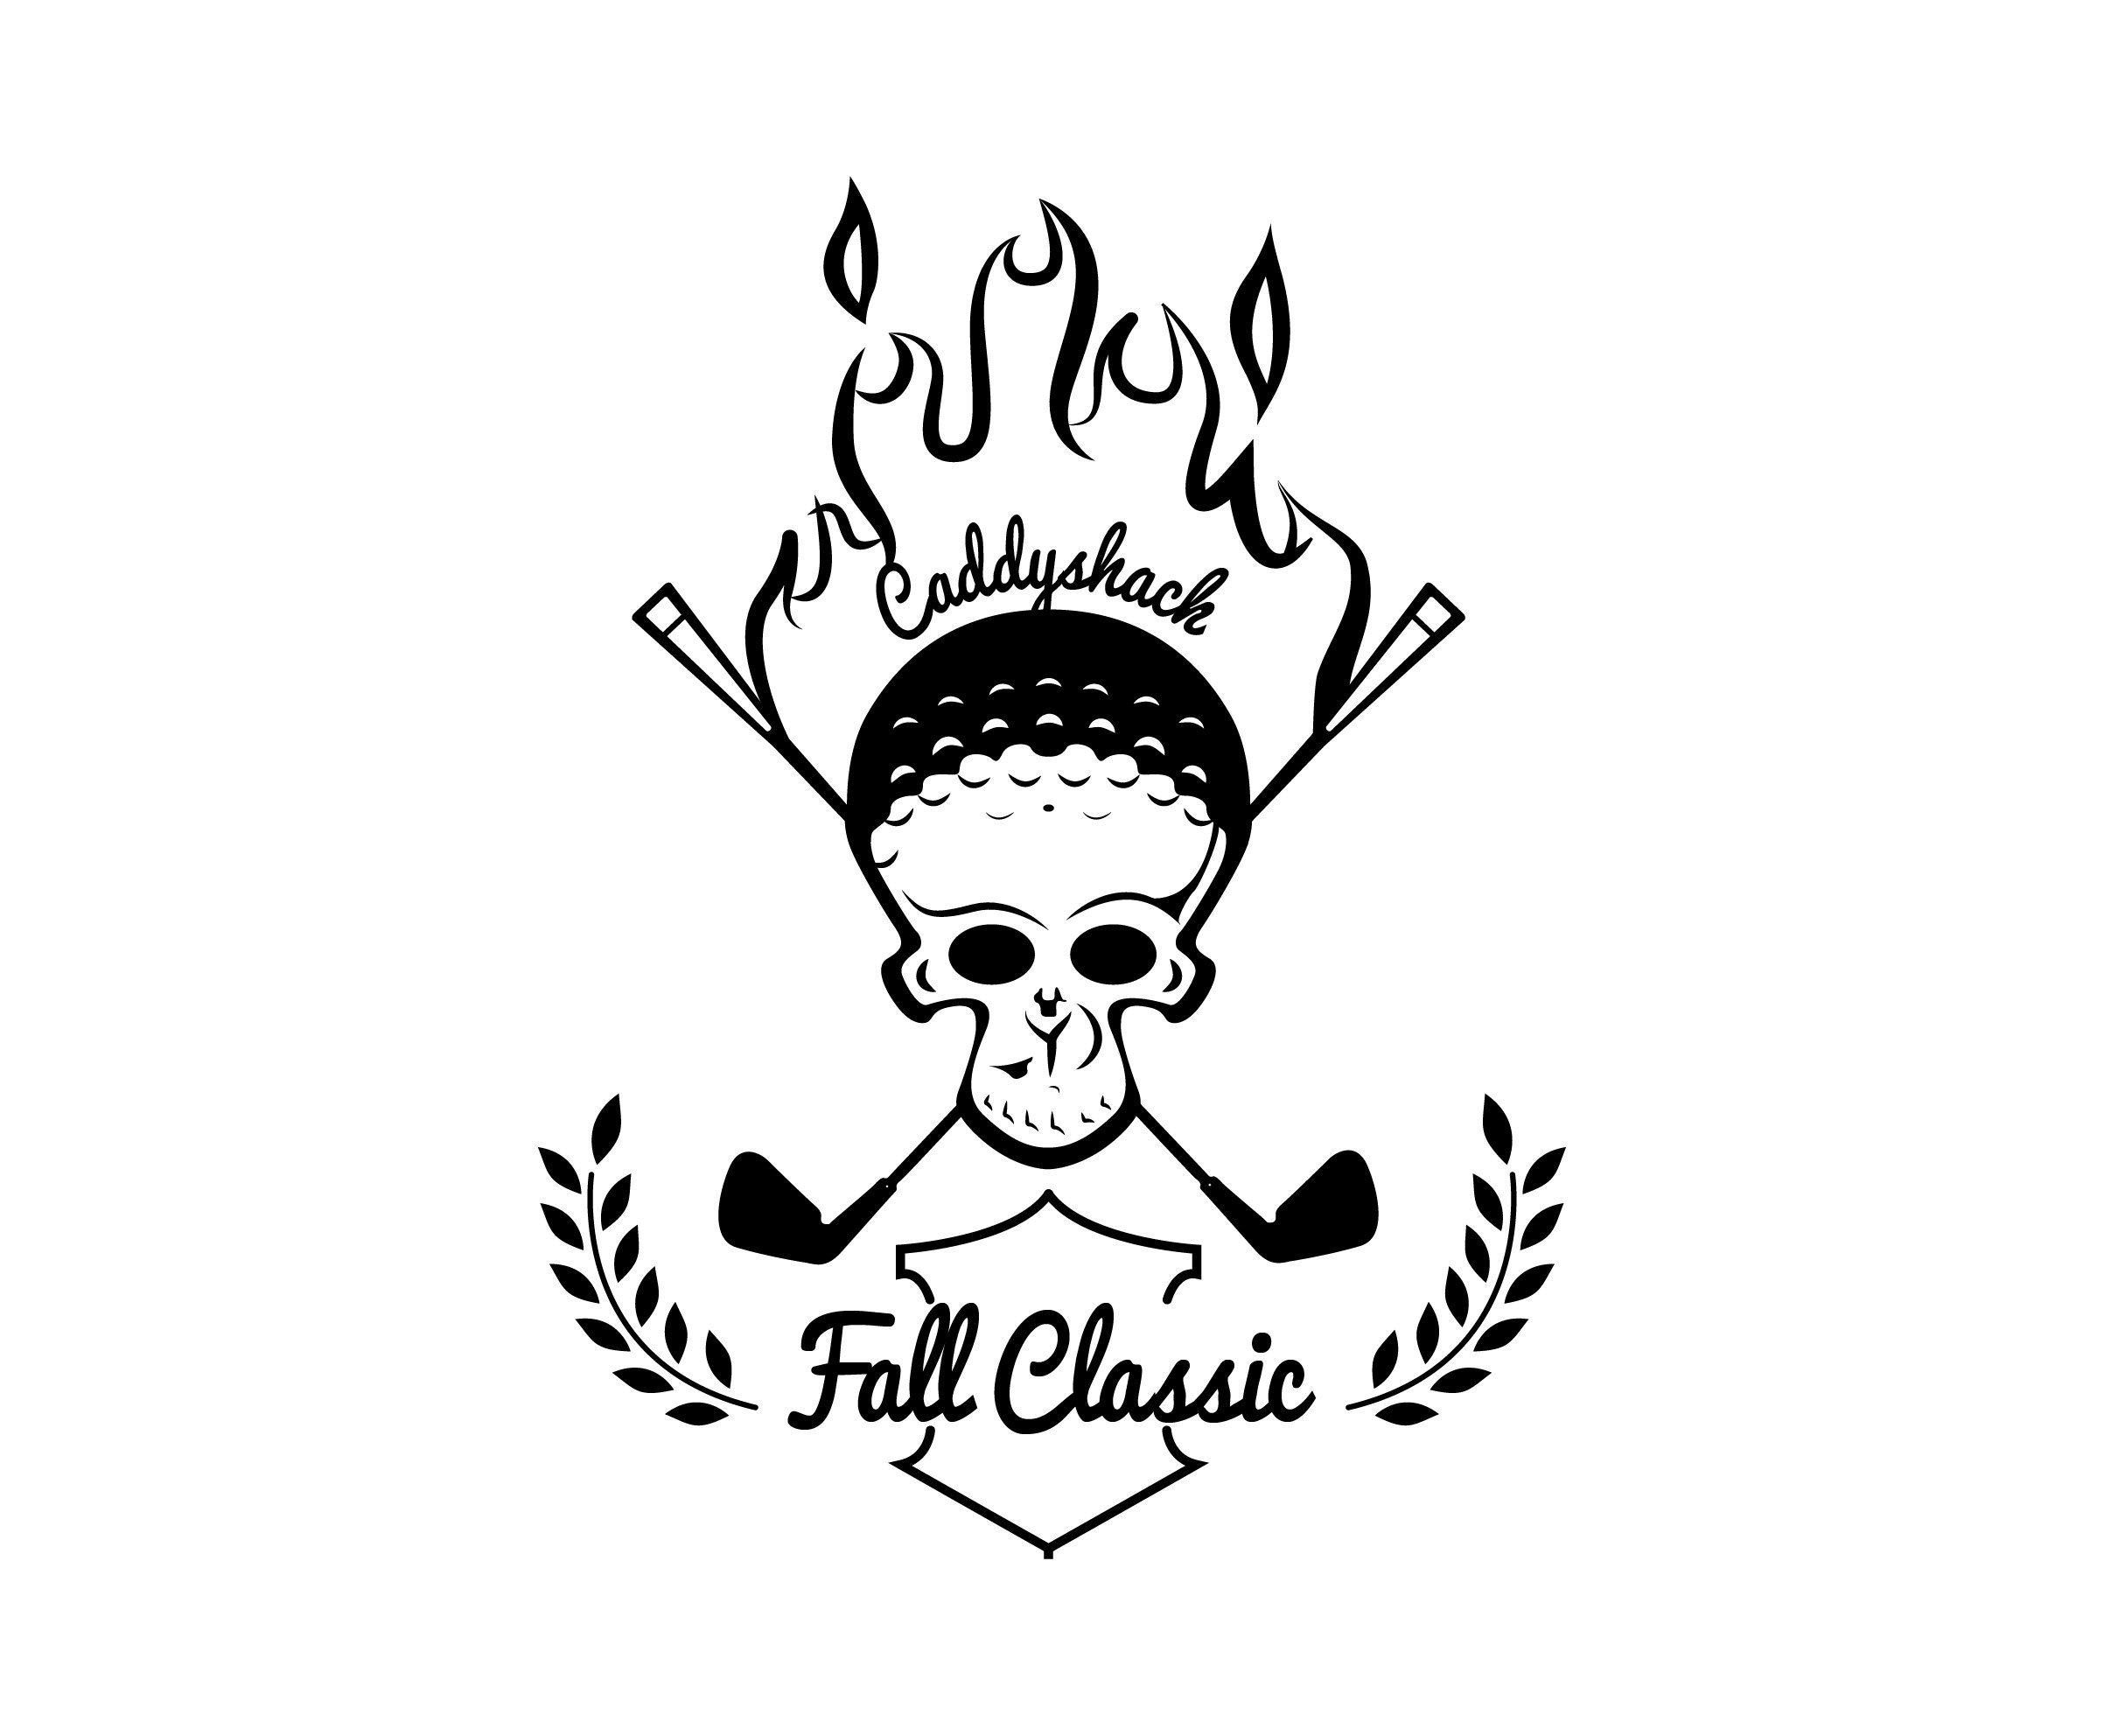 Caddyshack Fall Classic